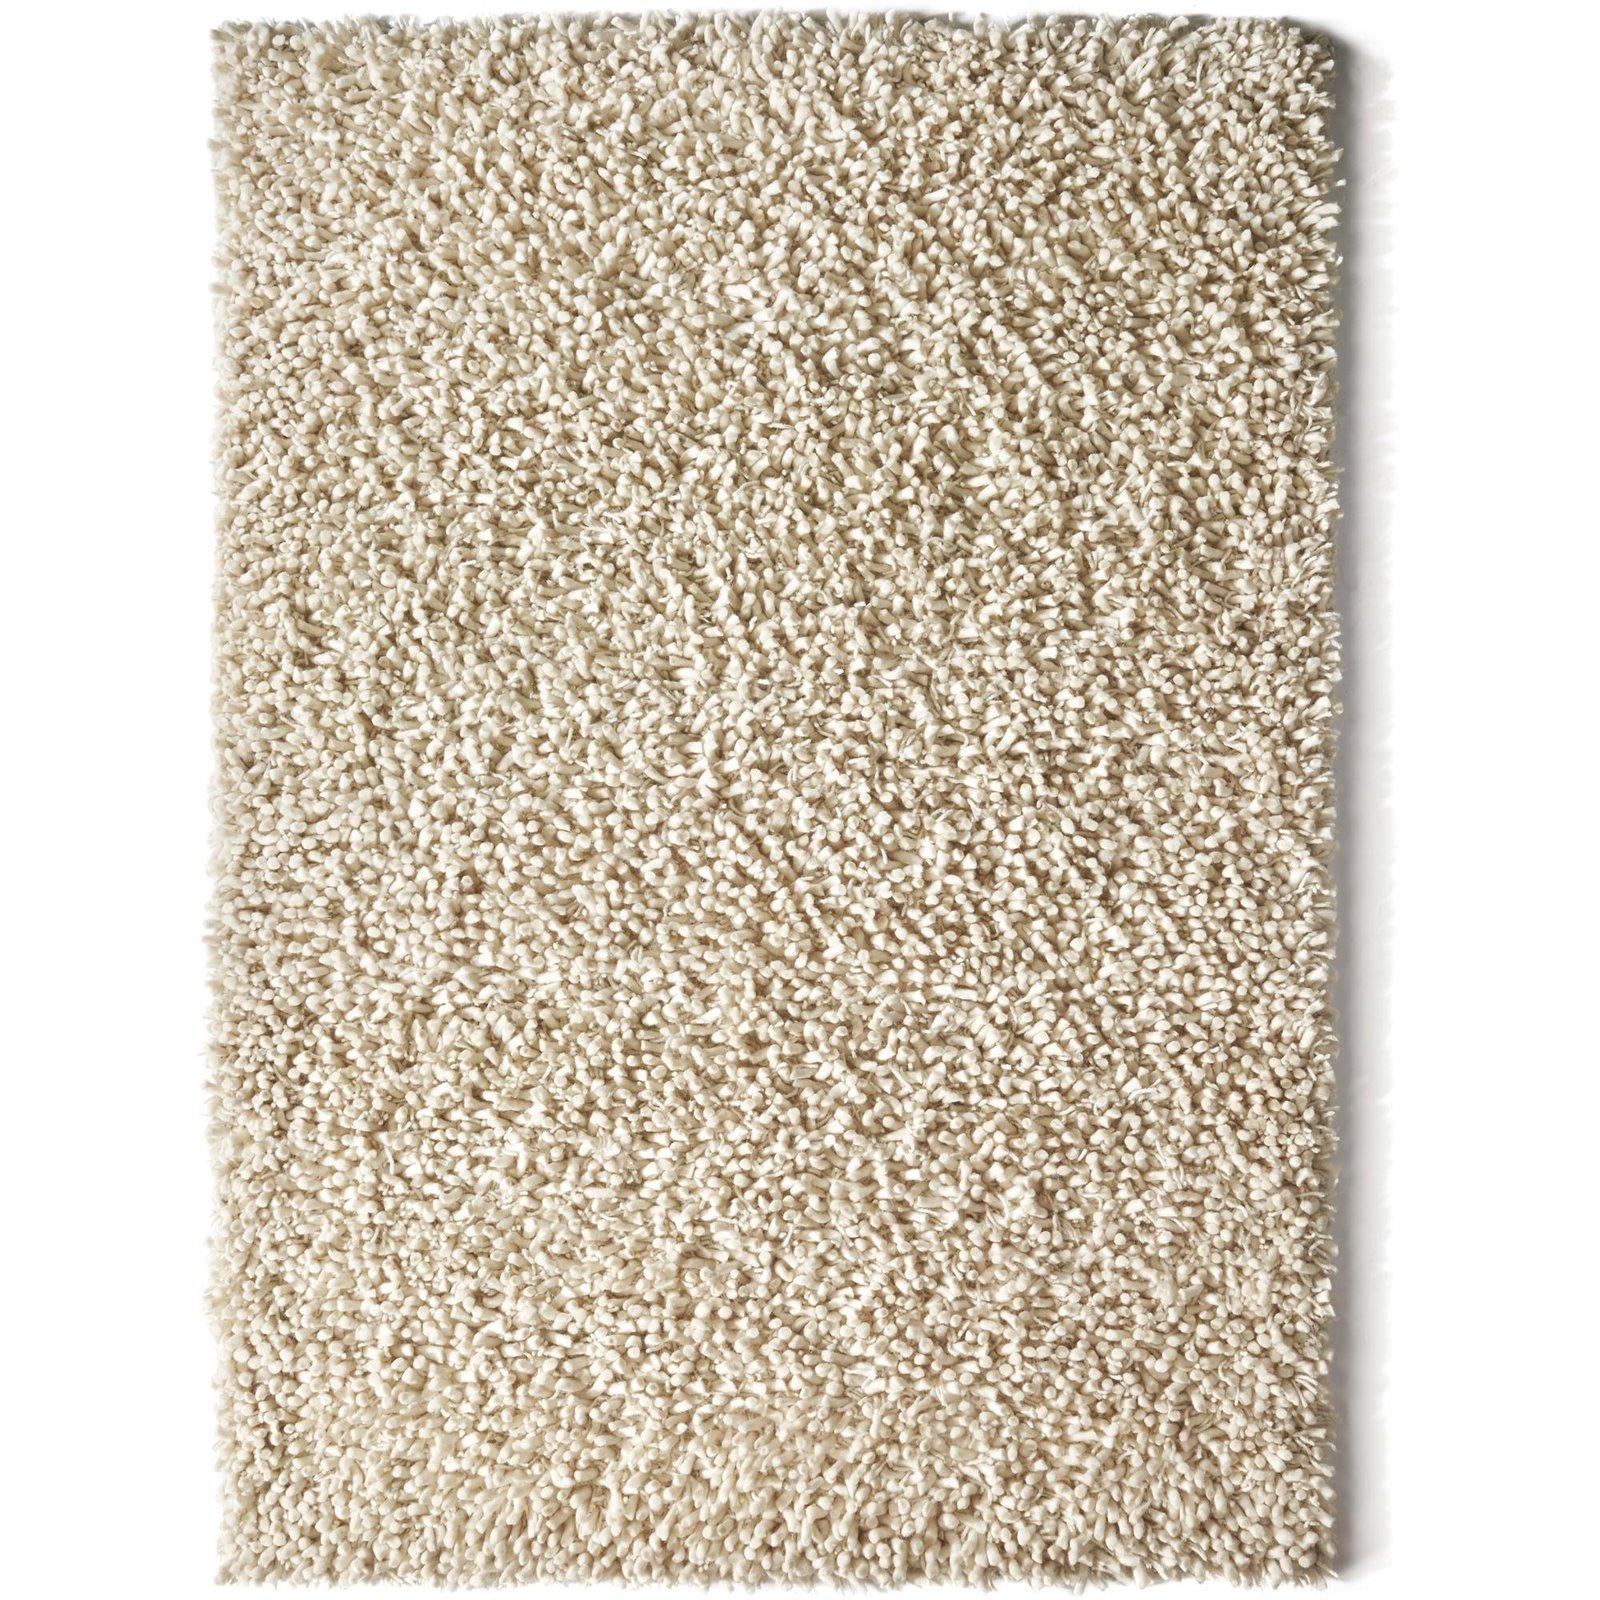 Maine Ivory Textured Wool Rug